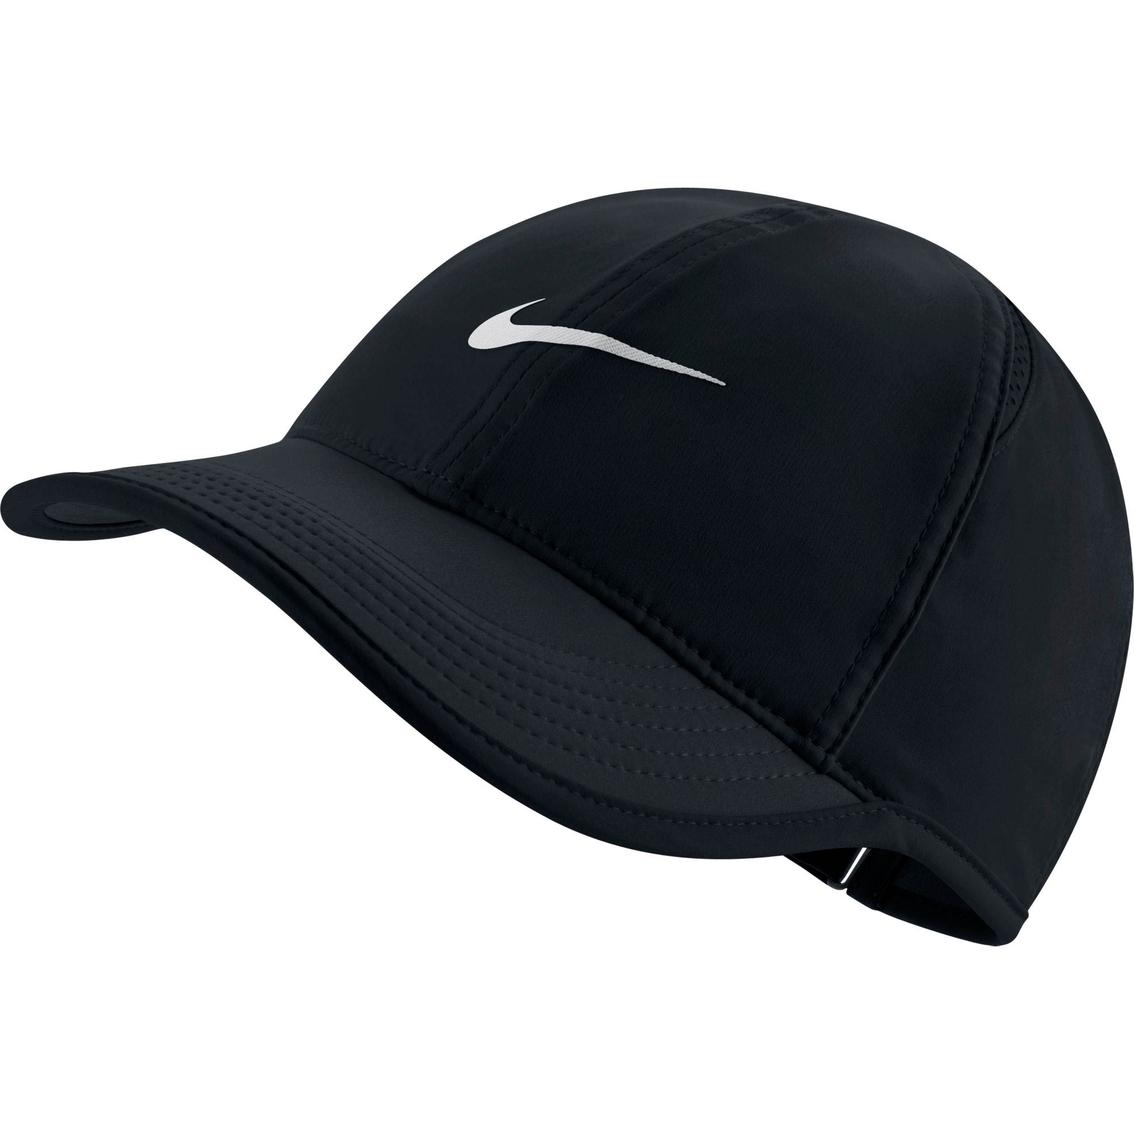 7a33a3fec2d Nike Featherlight 2.0 Tennis Cap